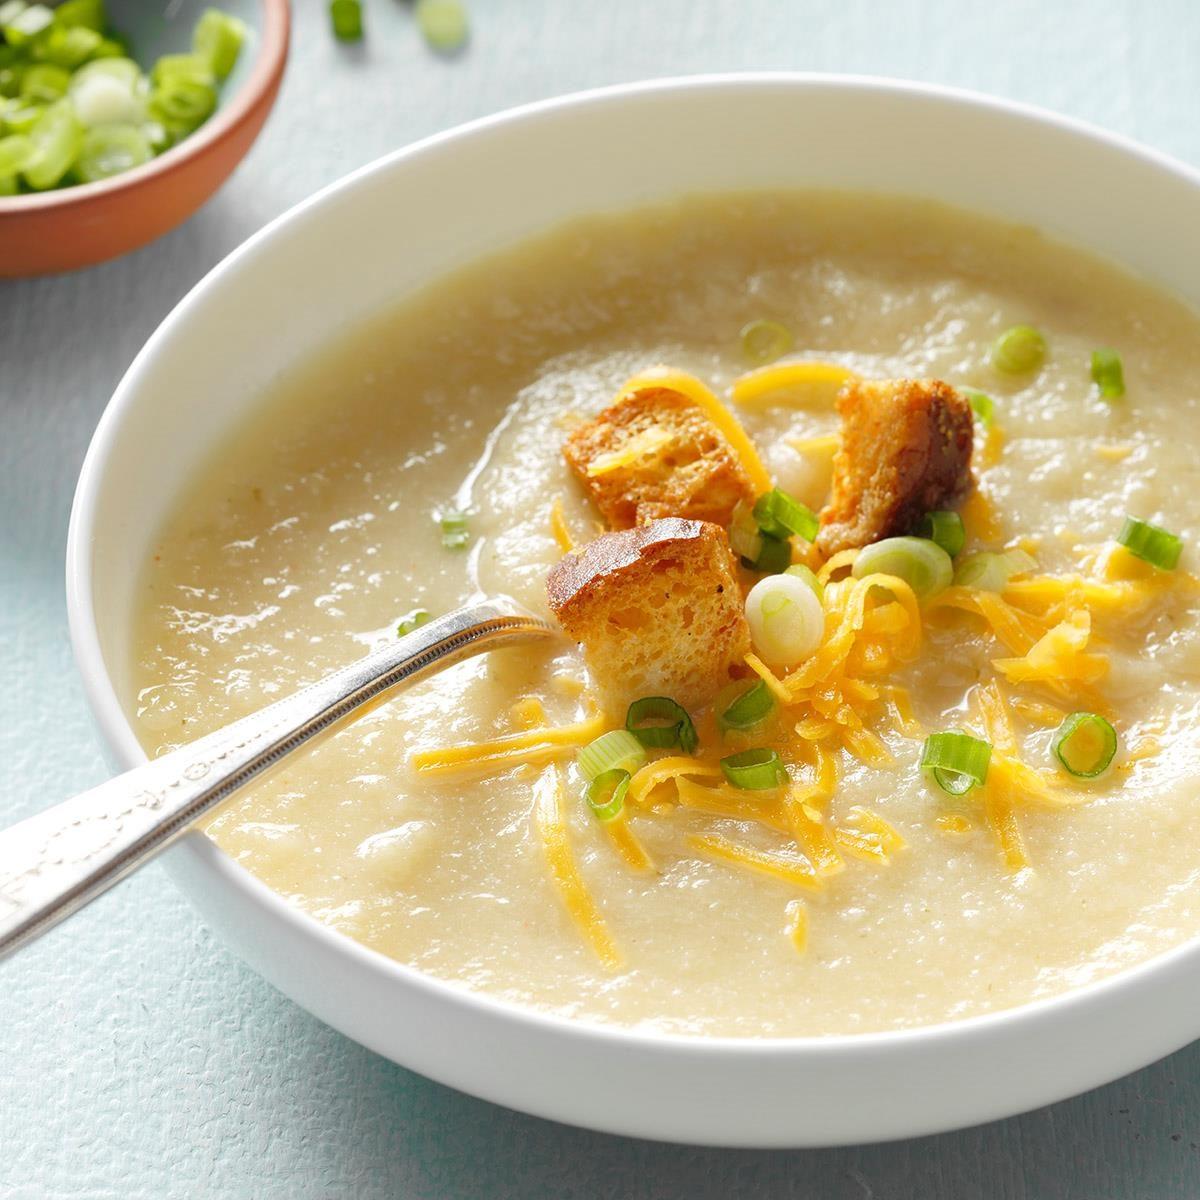 Slow cooker creamy cauliflower soup